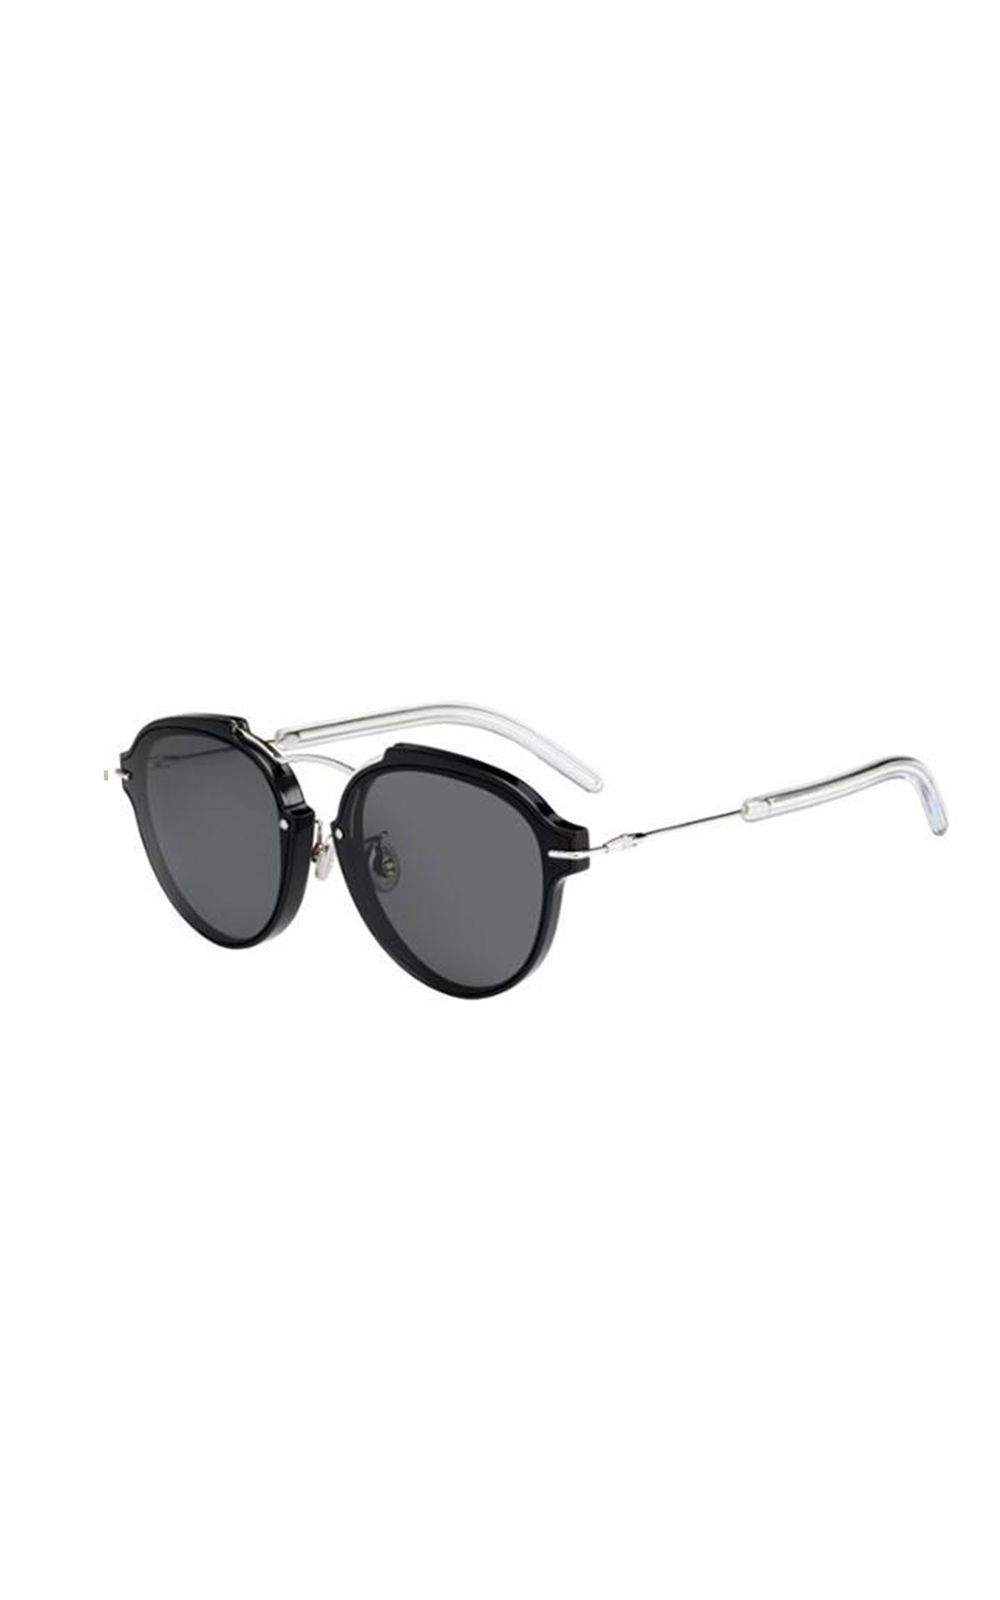 f570c724bff81 Óculos de Sol Dior Homme 220 ECLQT. undefined